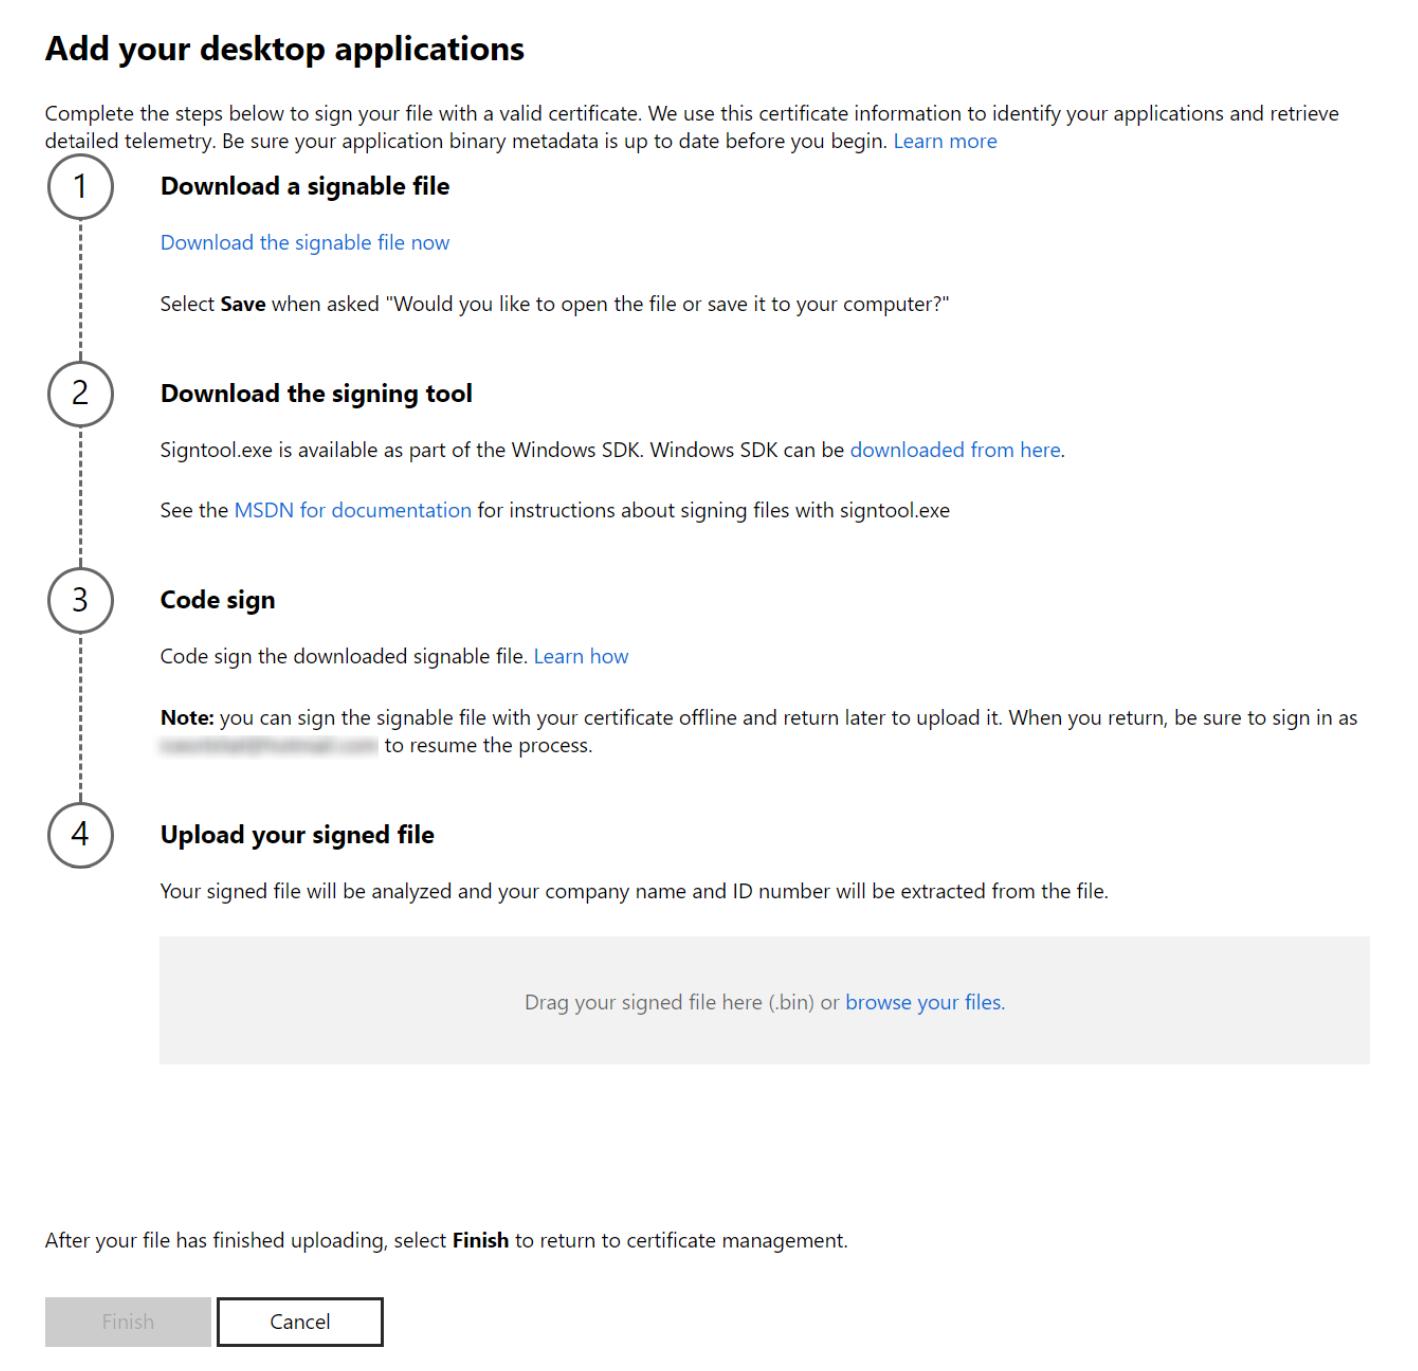 Windows Desktop Application Program - Windows applications